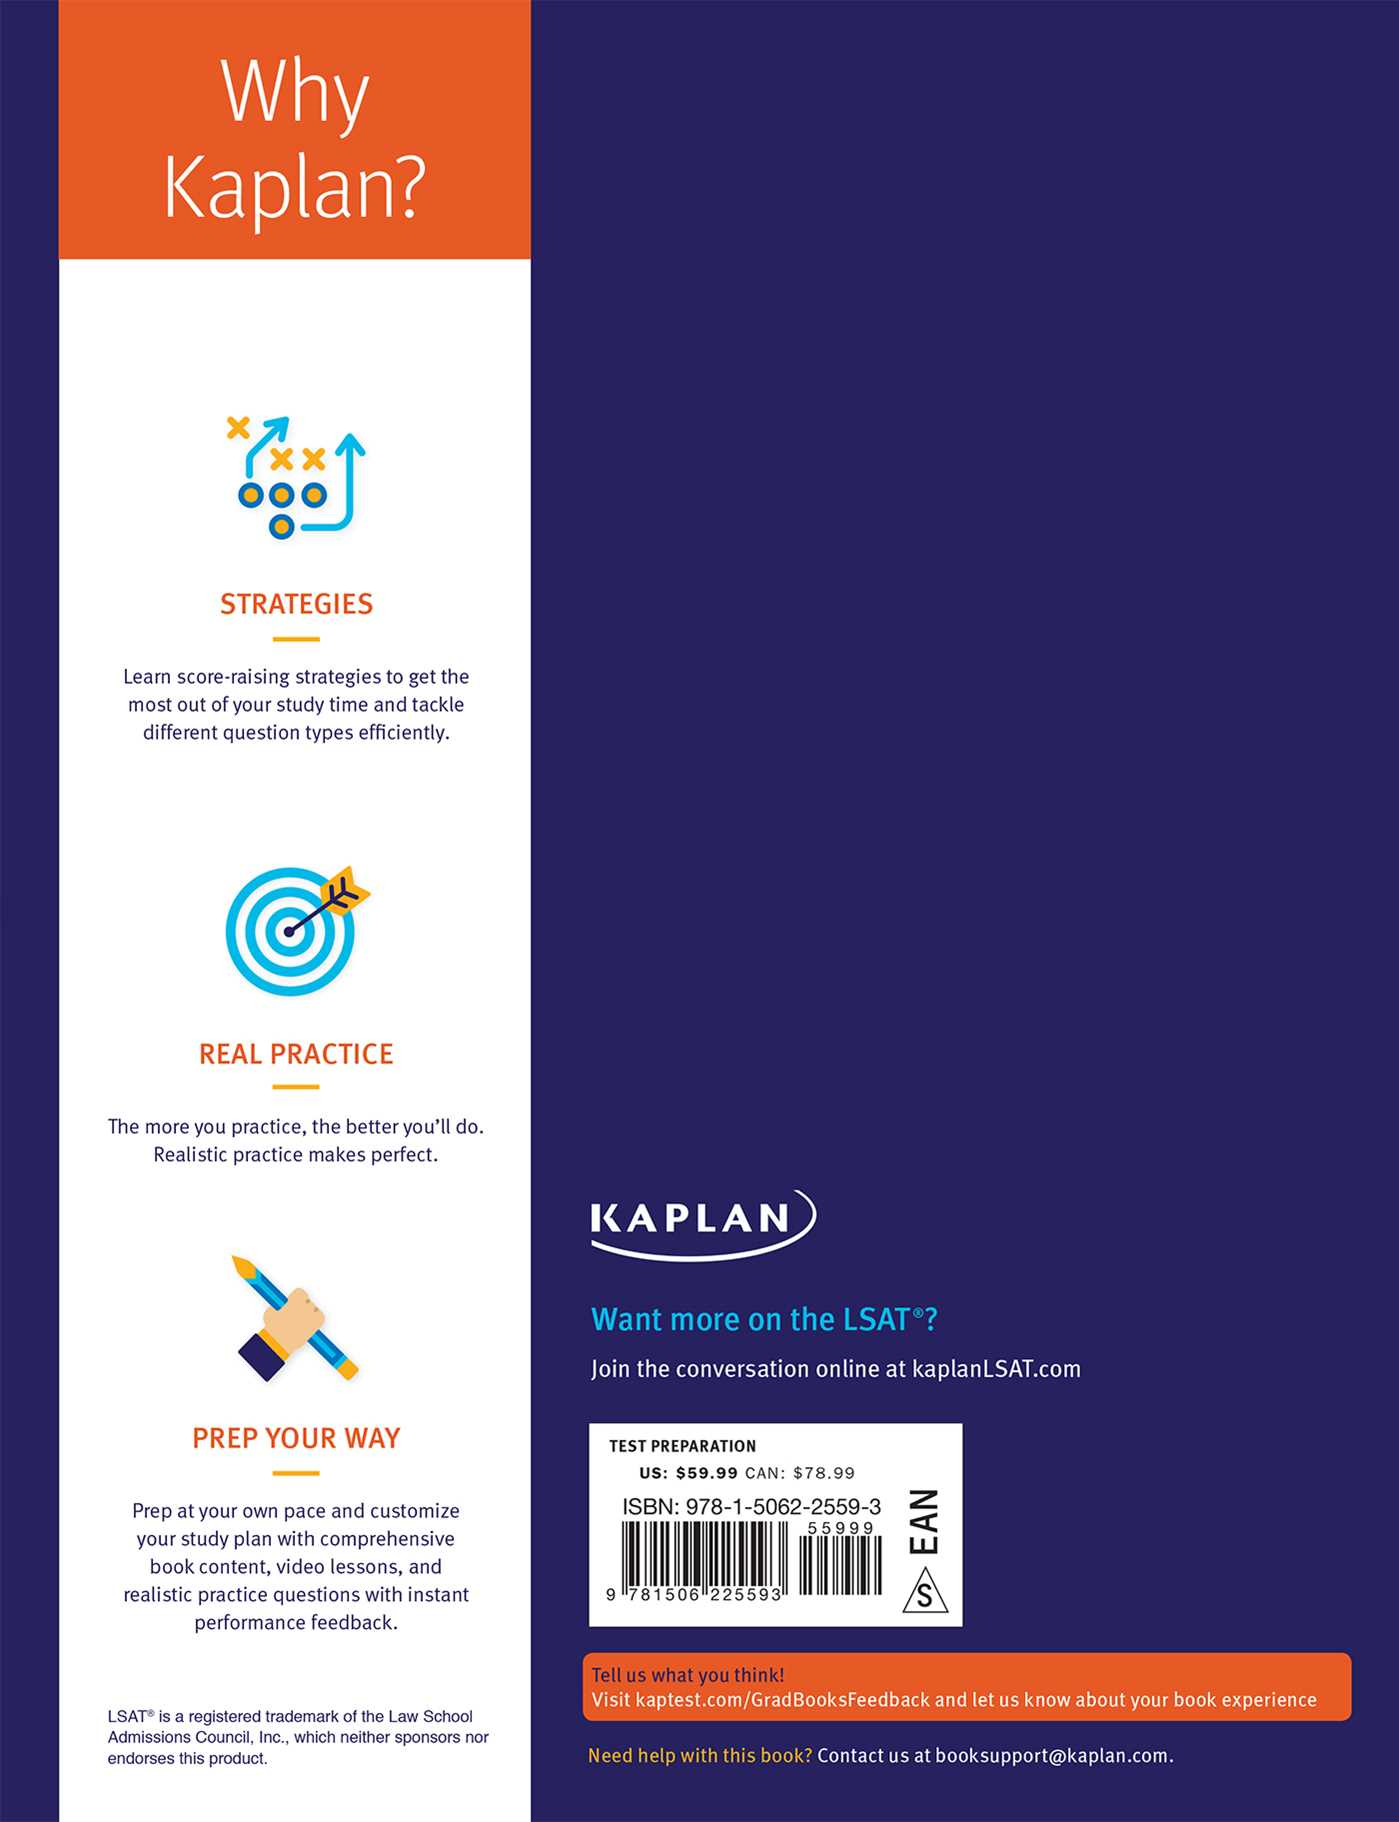 Best lsat prep course 2018 2019 new car reviews by language kompis lsat unlocked 2018 2019 book by kaplan test prep malvernweather Choice Image